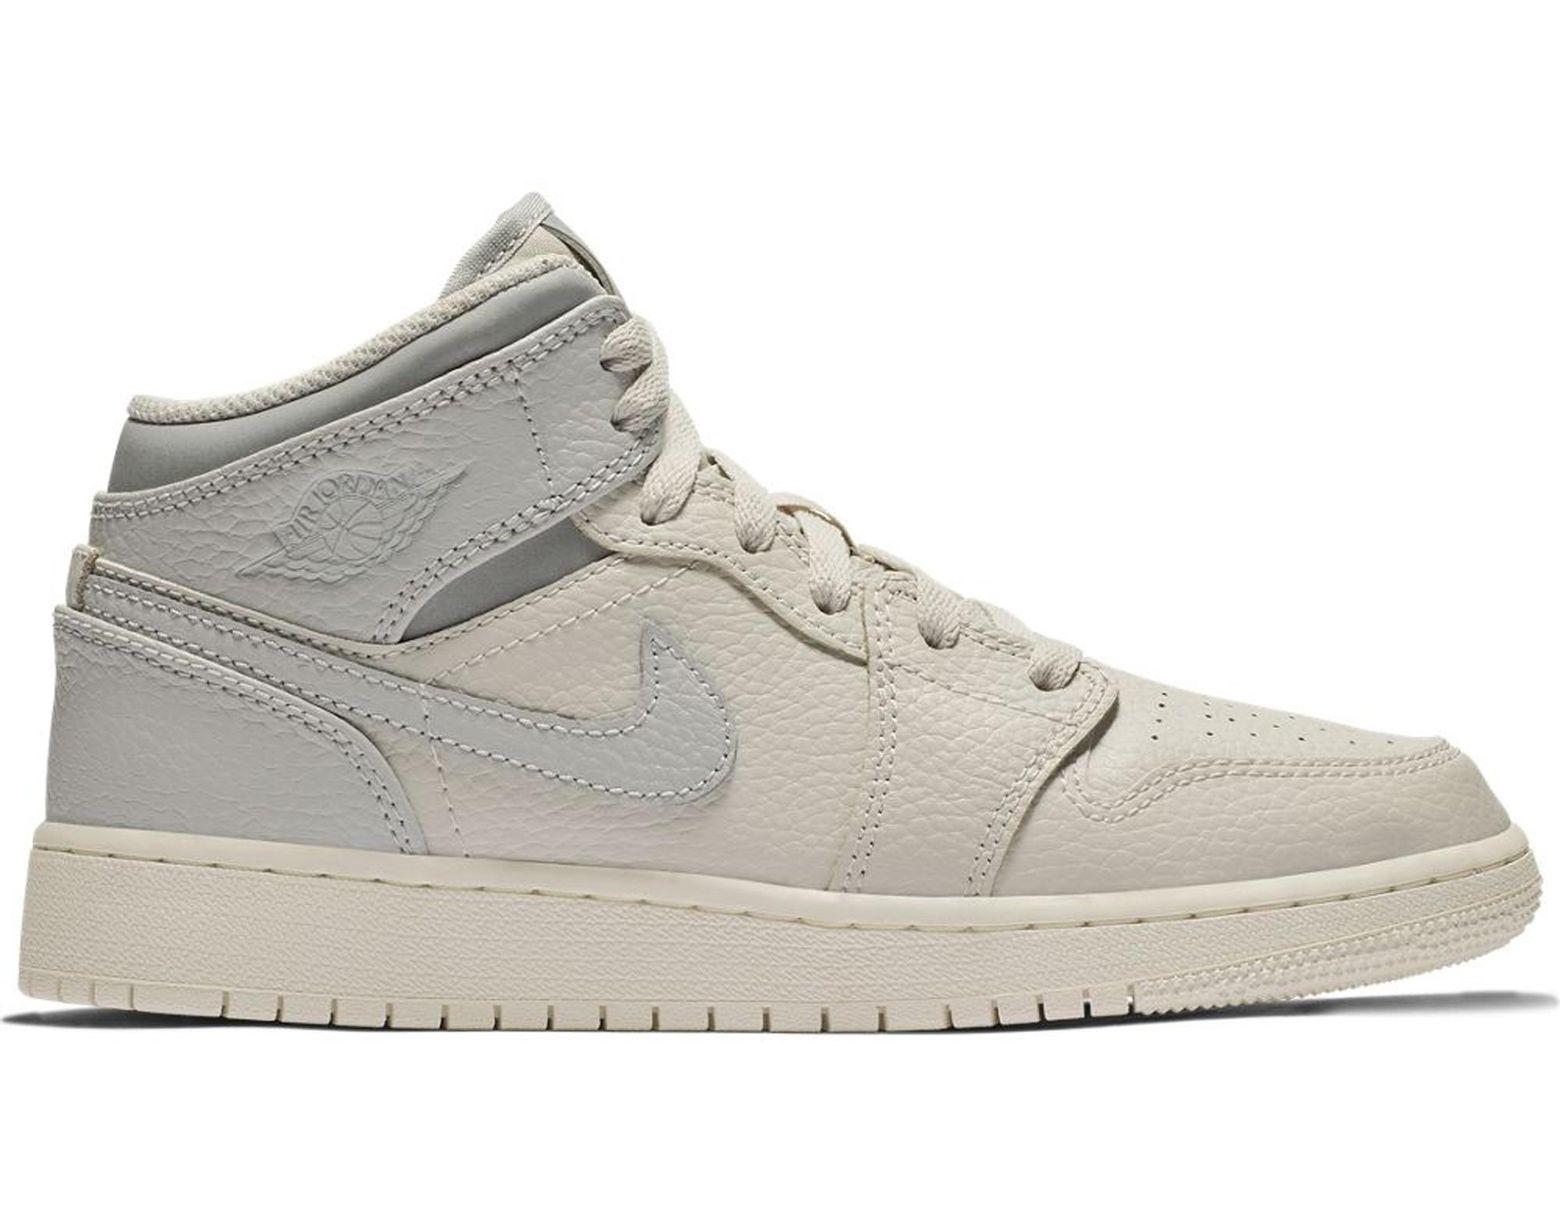 63e2ba25 Nike 1 Mid Light Bone Wolf Grey (gs) in Gray for Men - Lyst